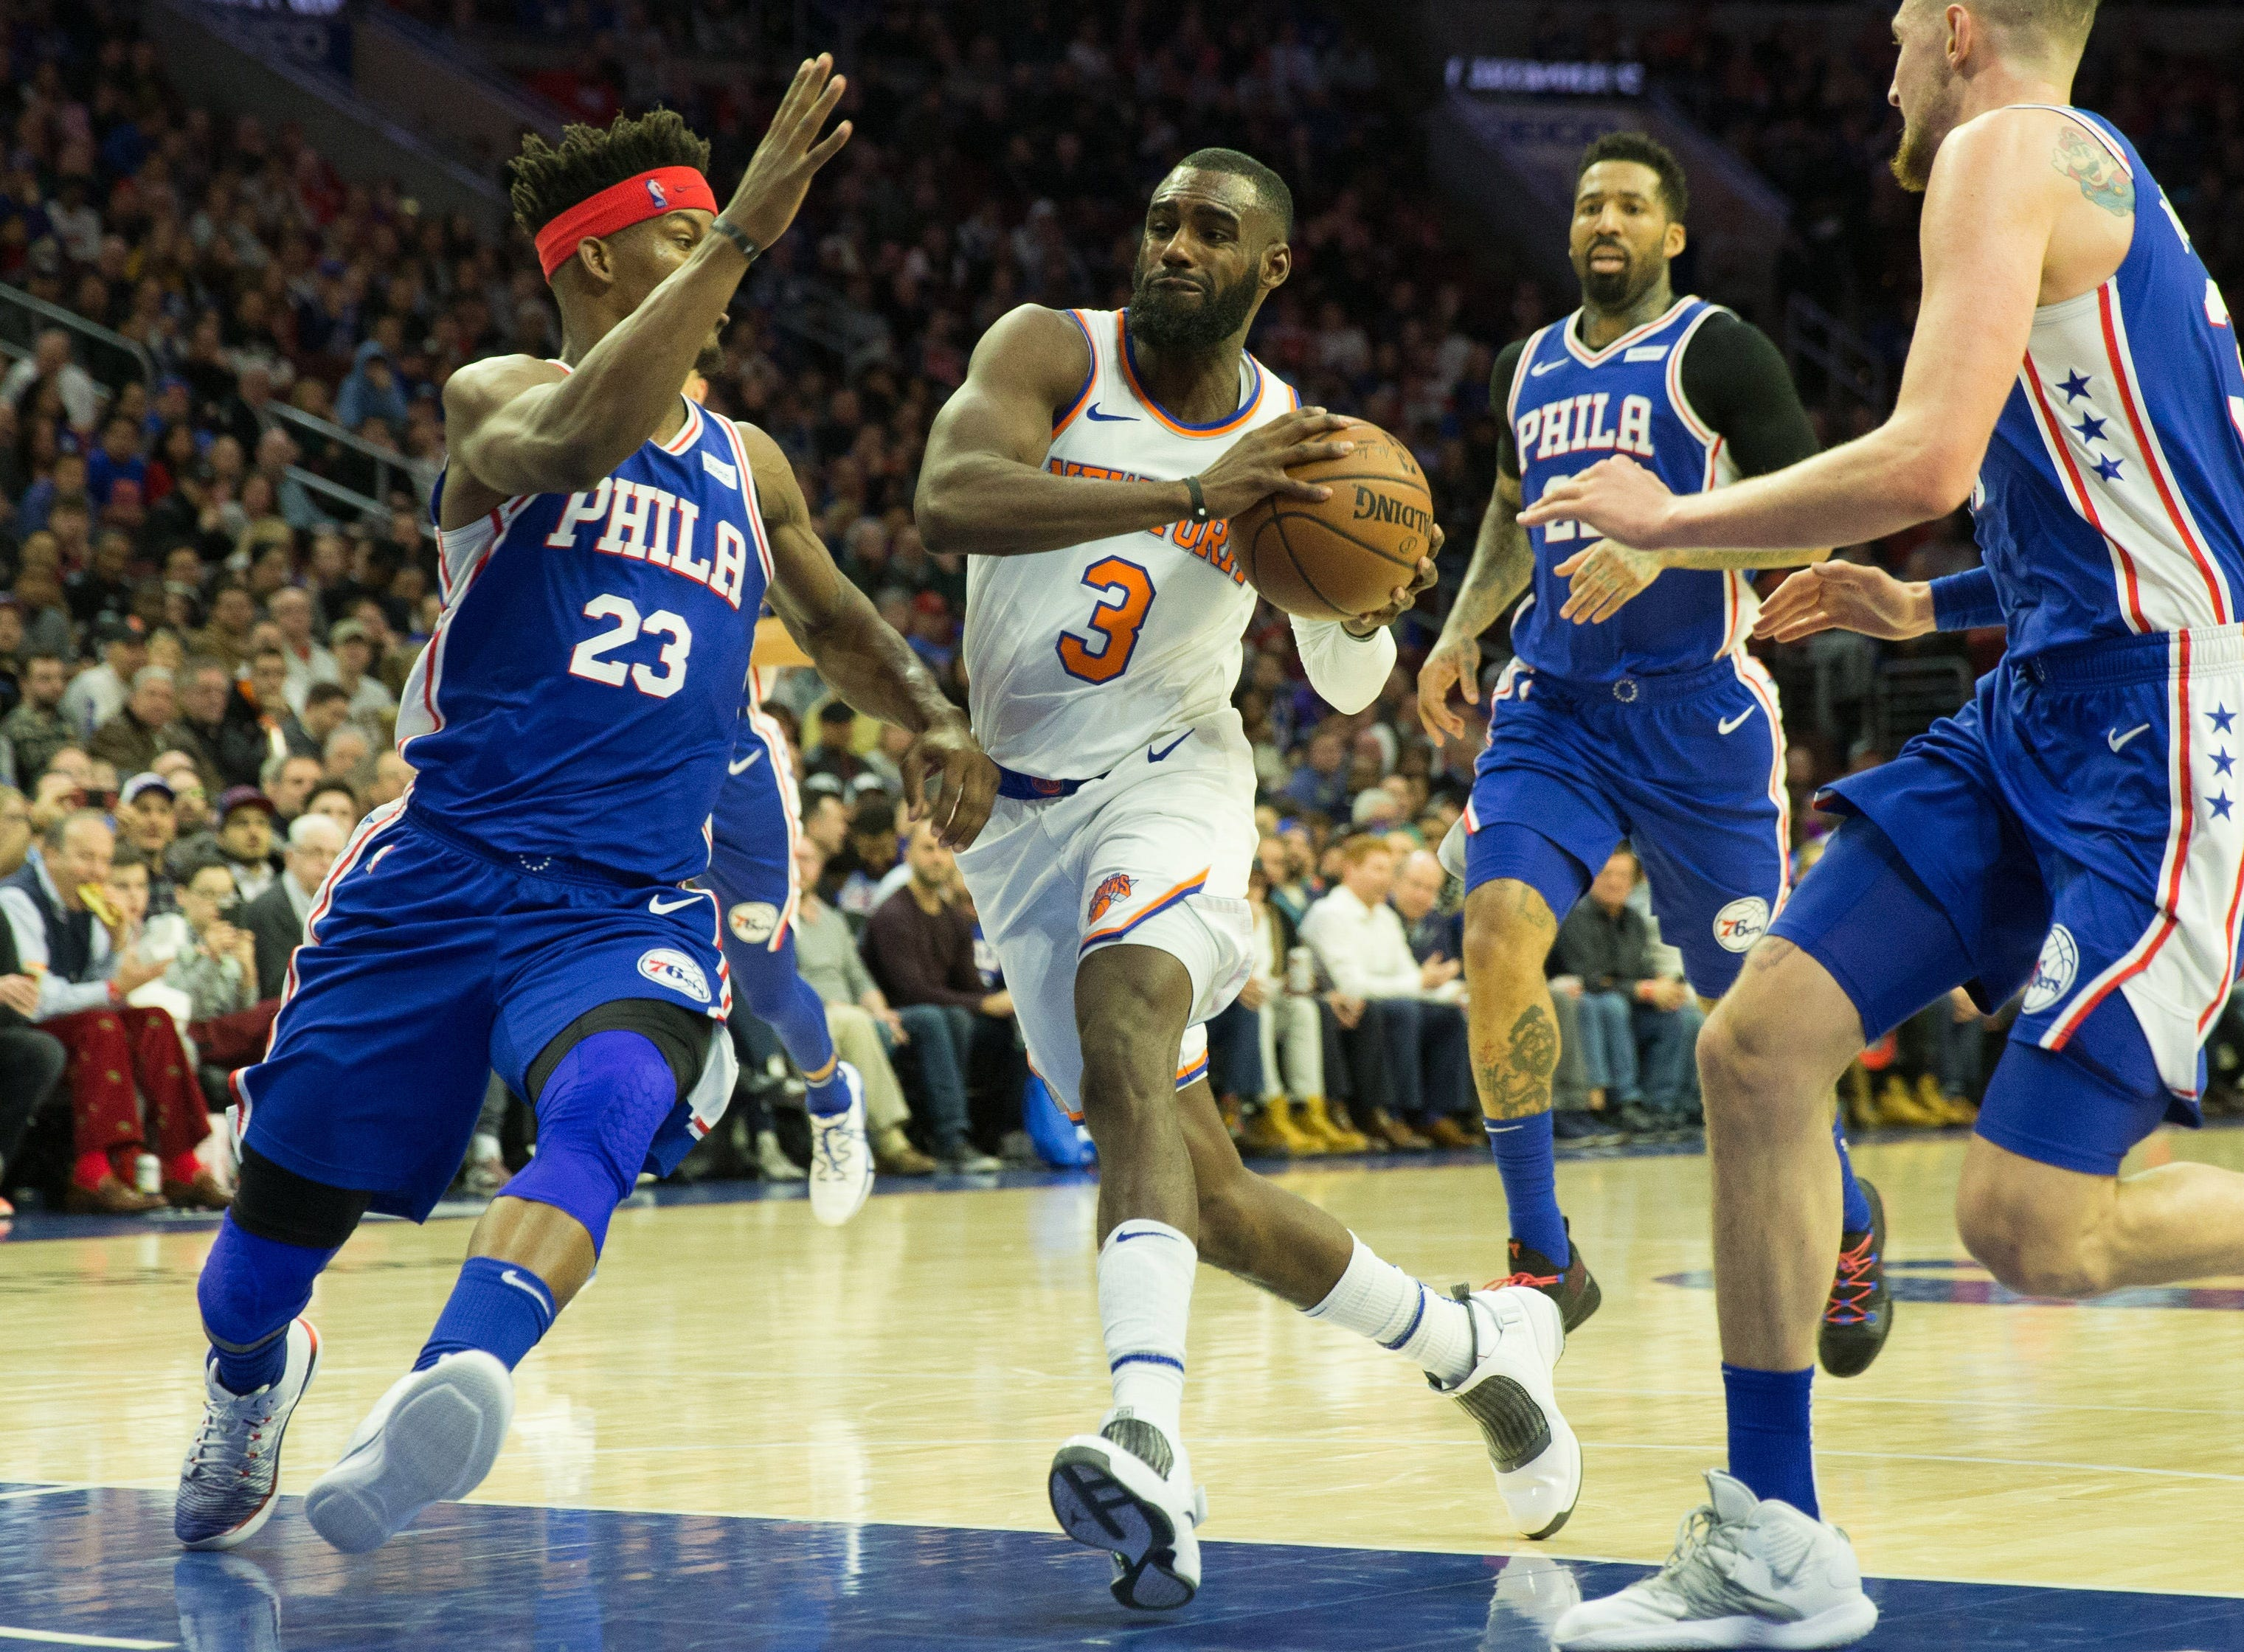 New York Knicks guard Tim Hardaway Jr. (3) drives against Philadelphia 76ers guard Jimmy Butler (23) during the second quarter at Wells Fargo Center.